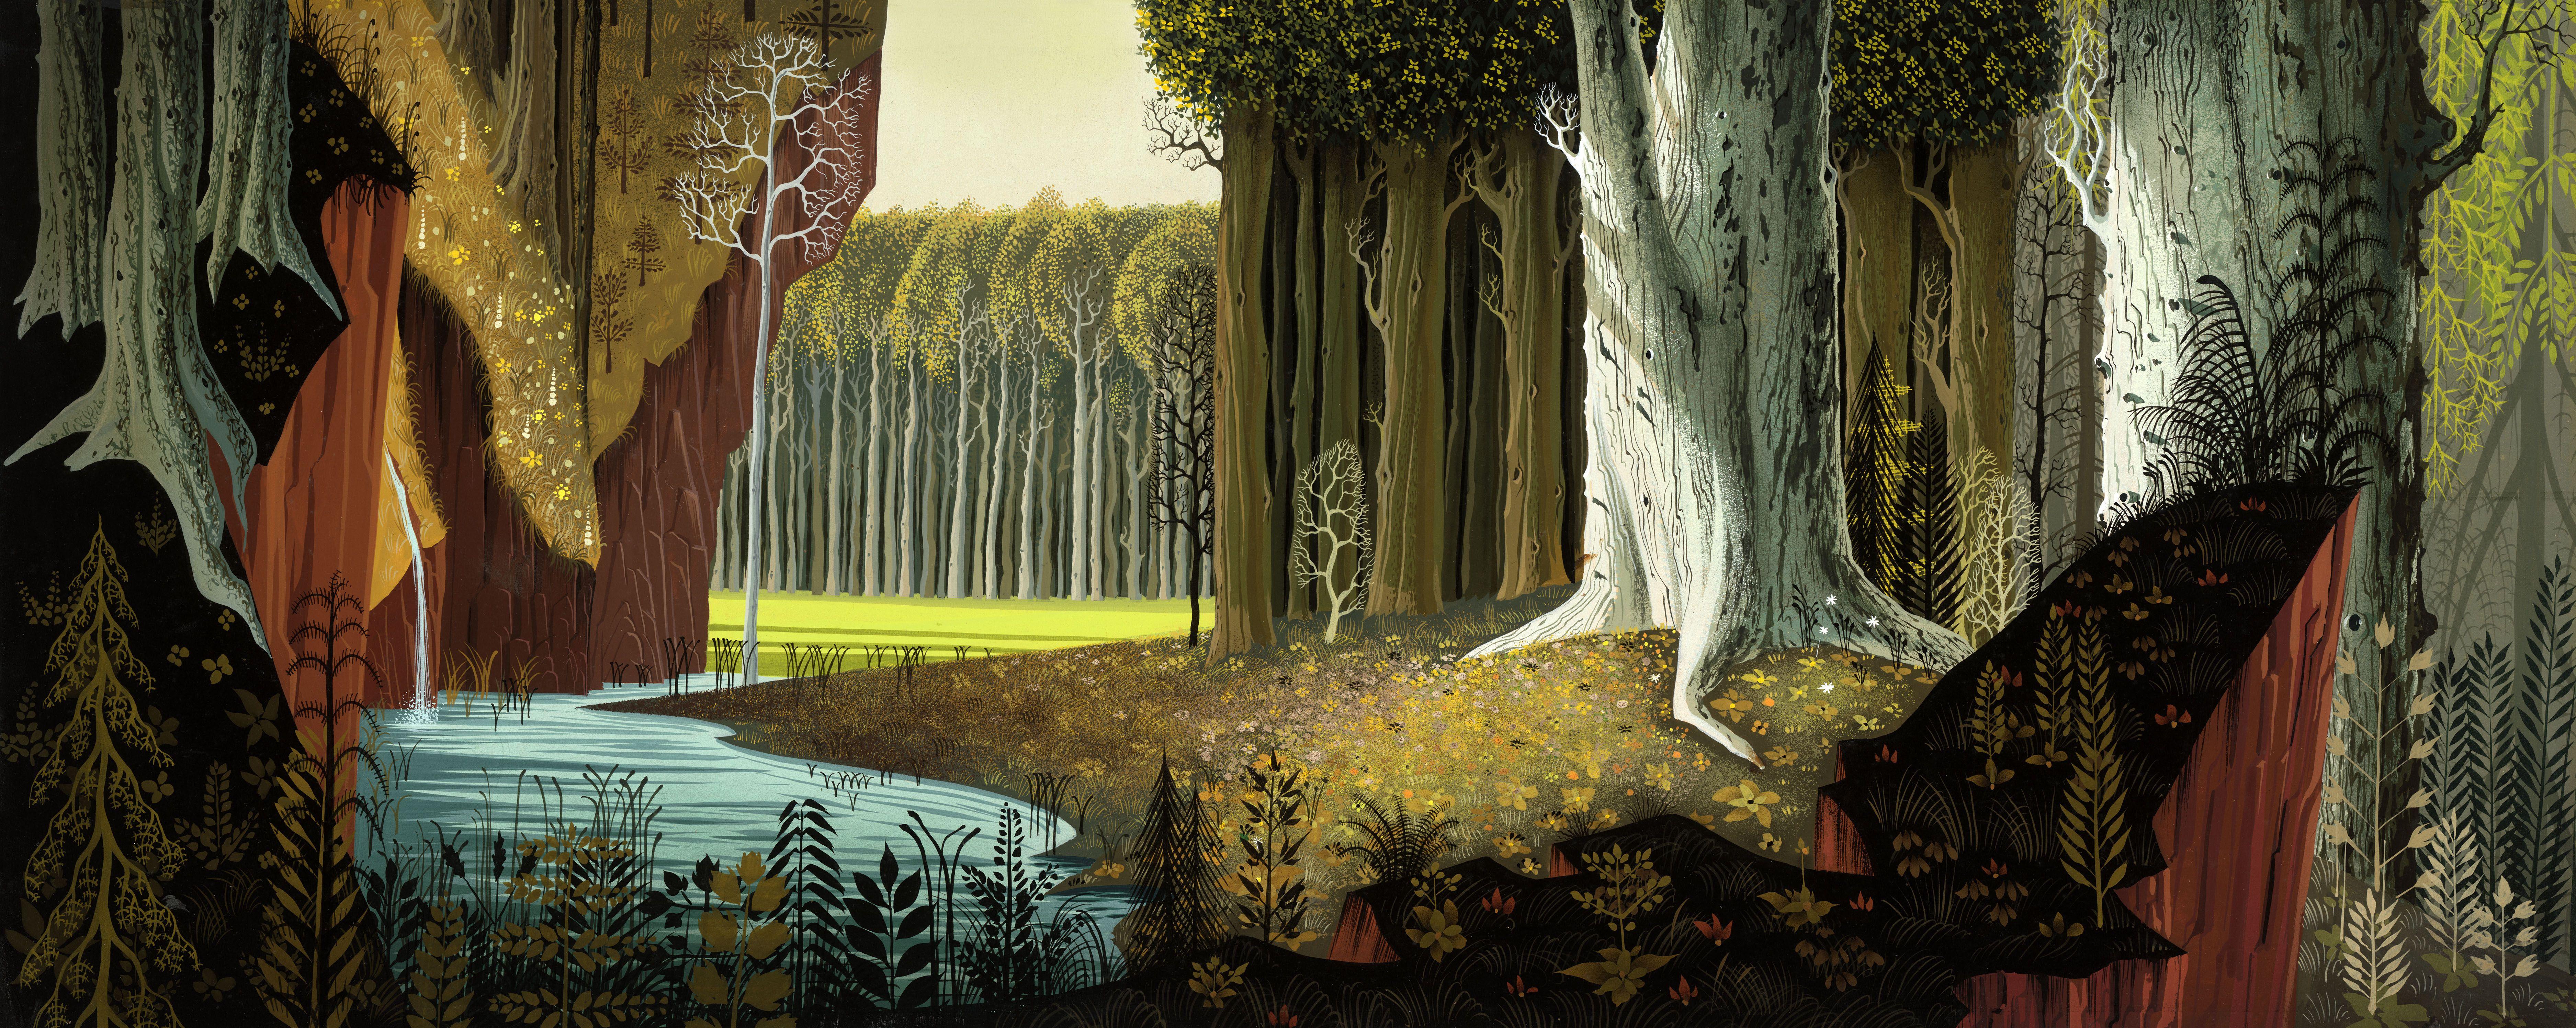 Sleeping Beauty concept art by Eyvind Earle | Concept art ...